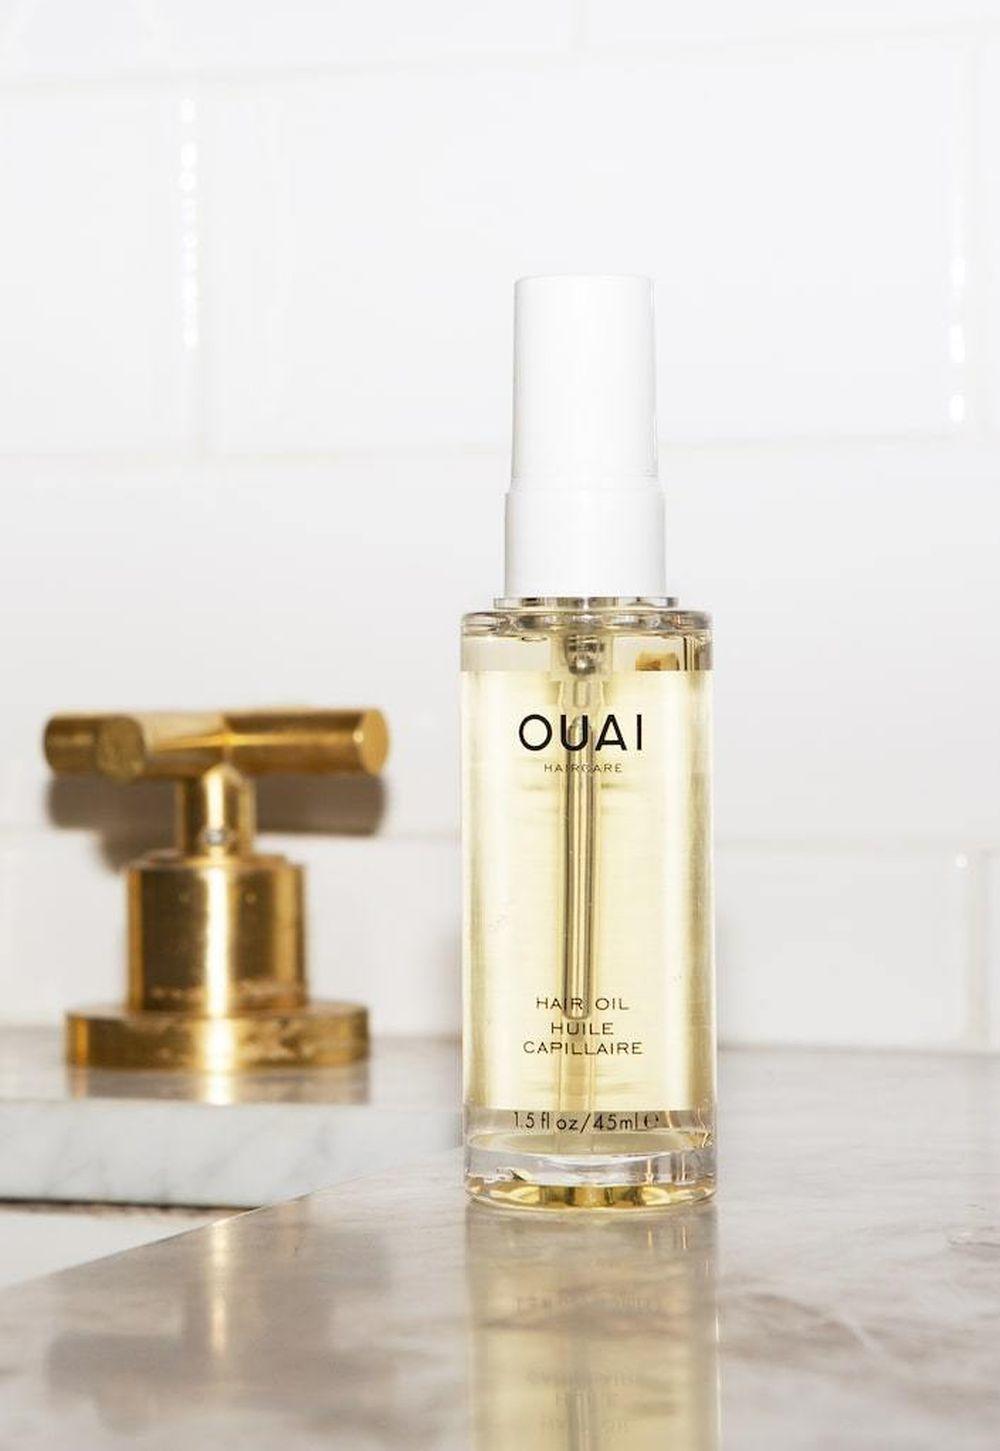 Hair Oil de The Ouai